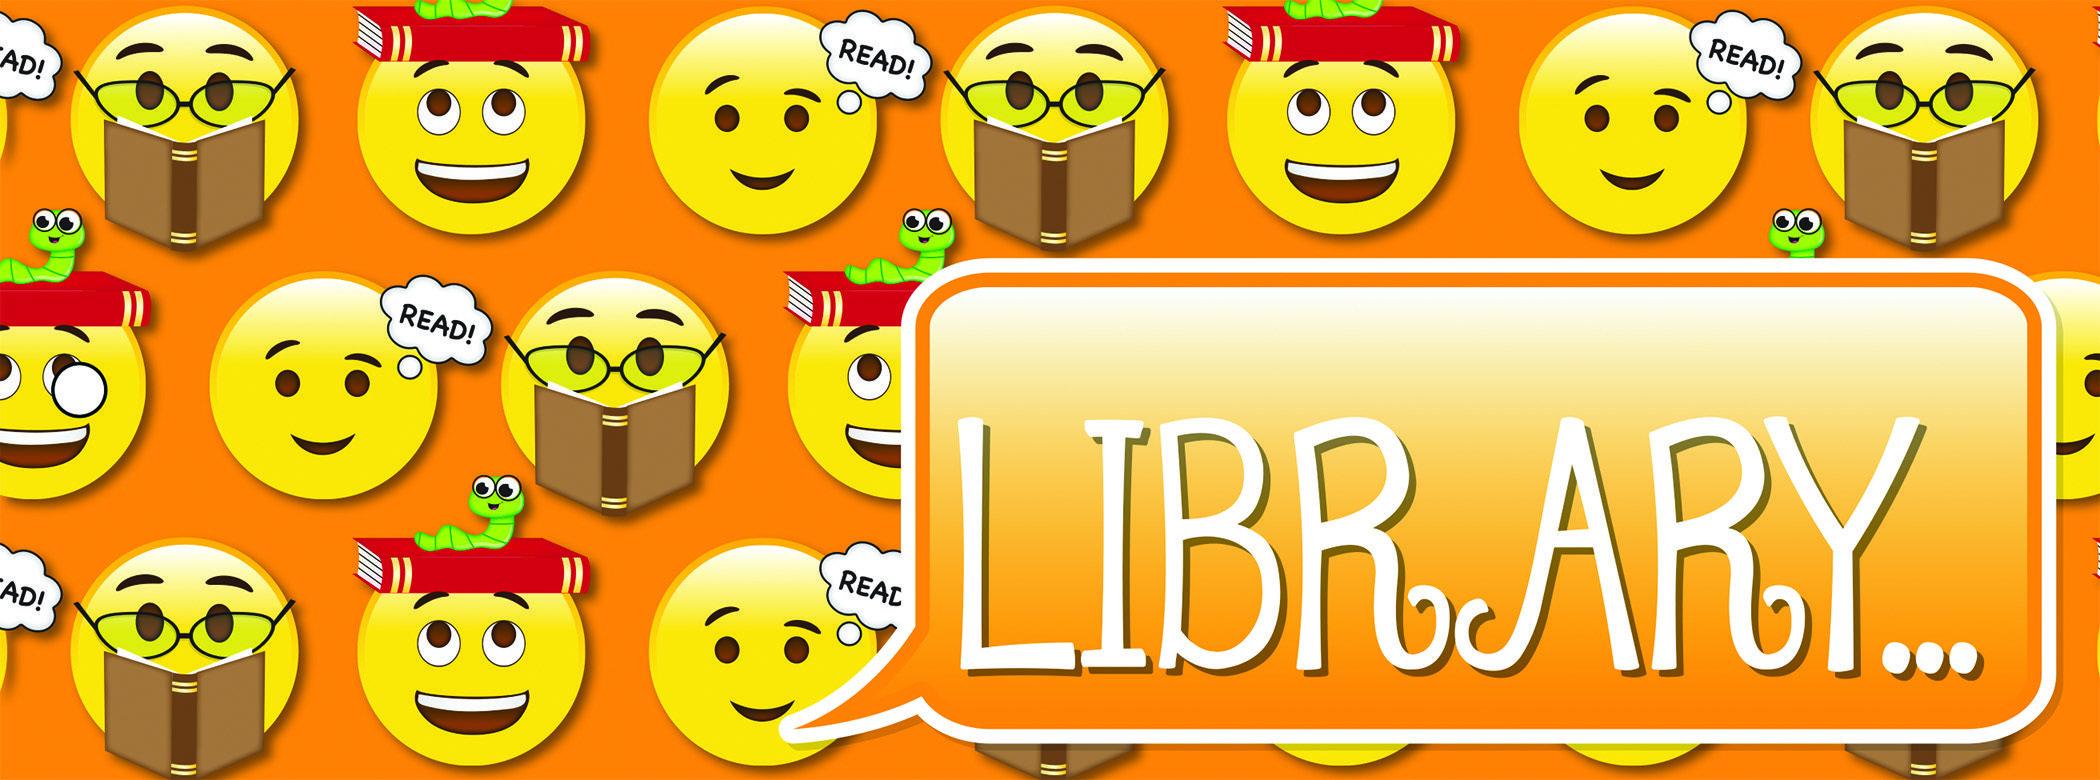 Emoji Library Laminated Pass Laminated Hall Passes